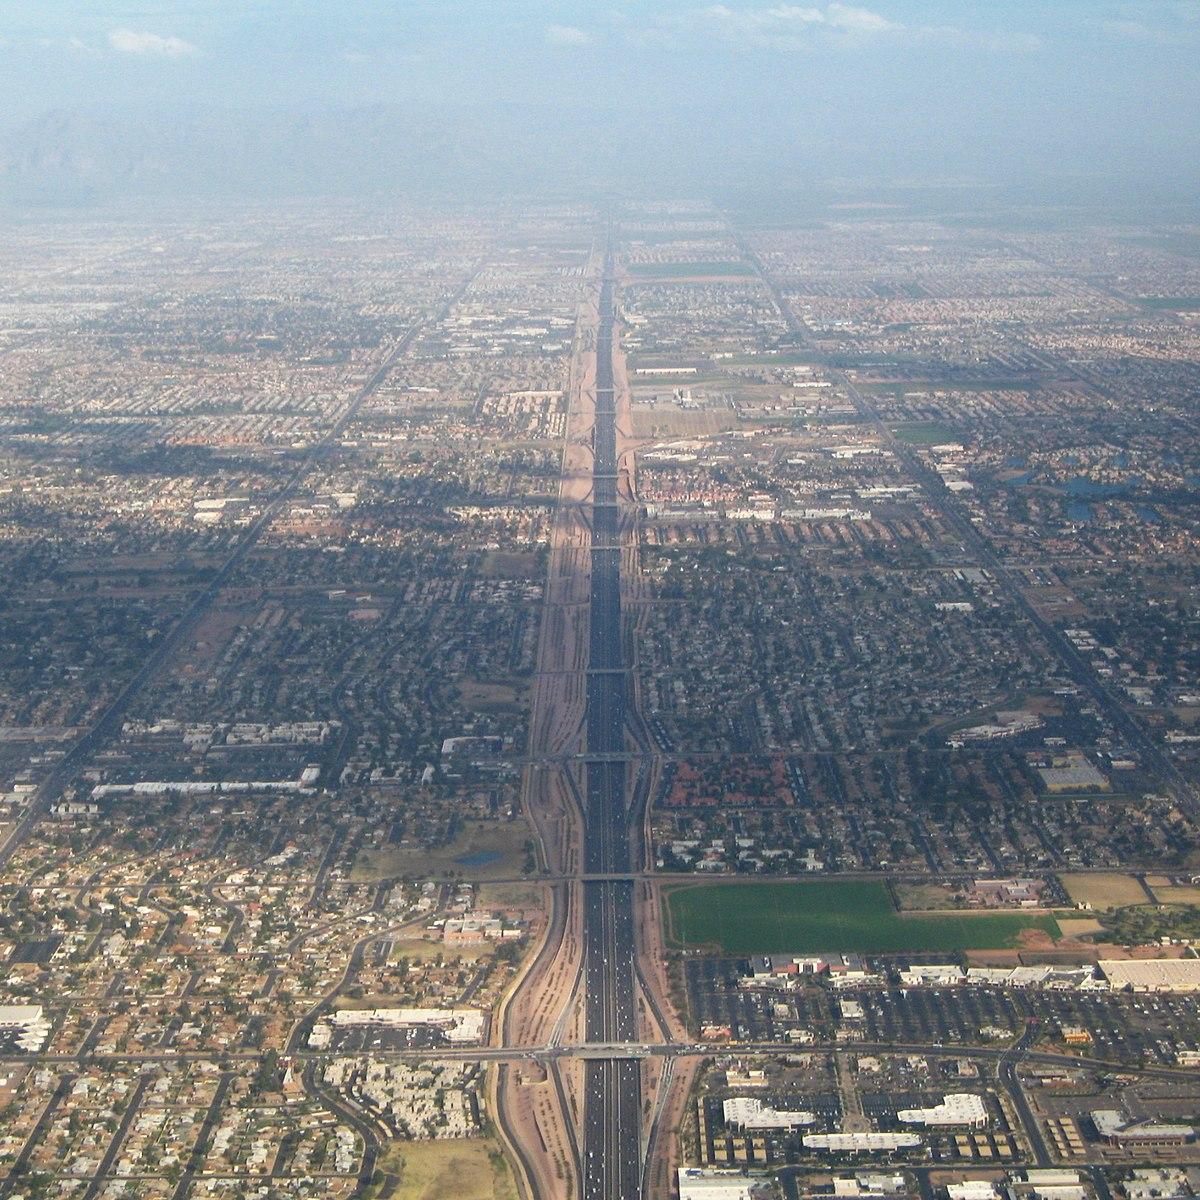 Us 60 Mile Marker Map U.S. Route 60 in Arizona   Wikipedia